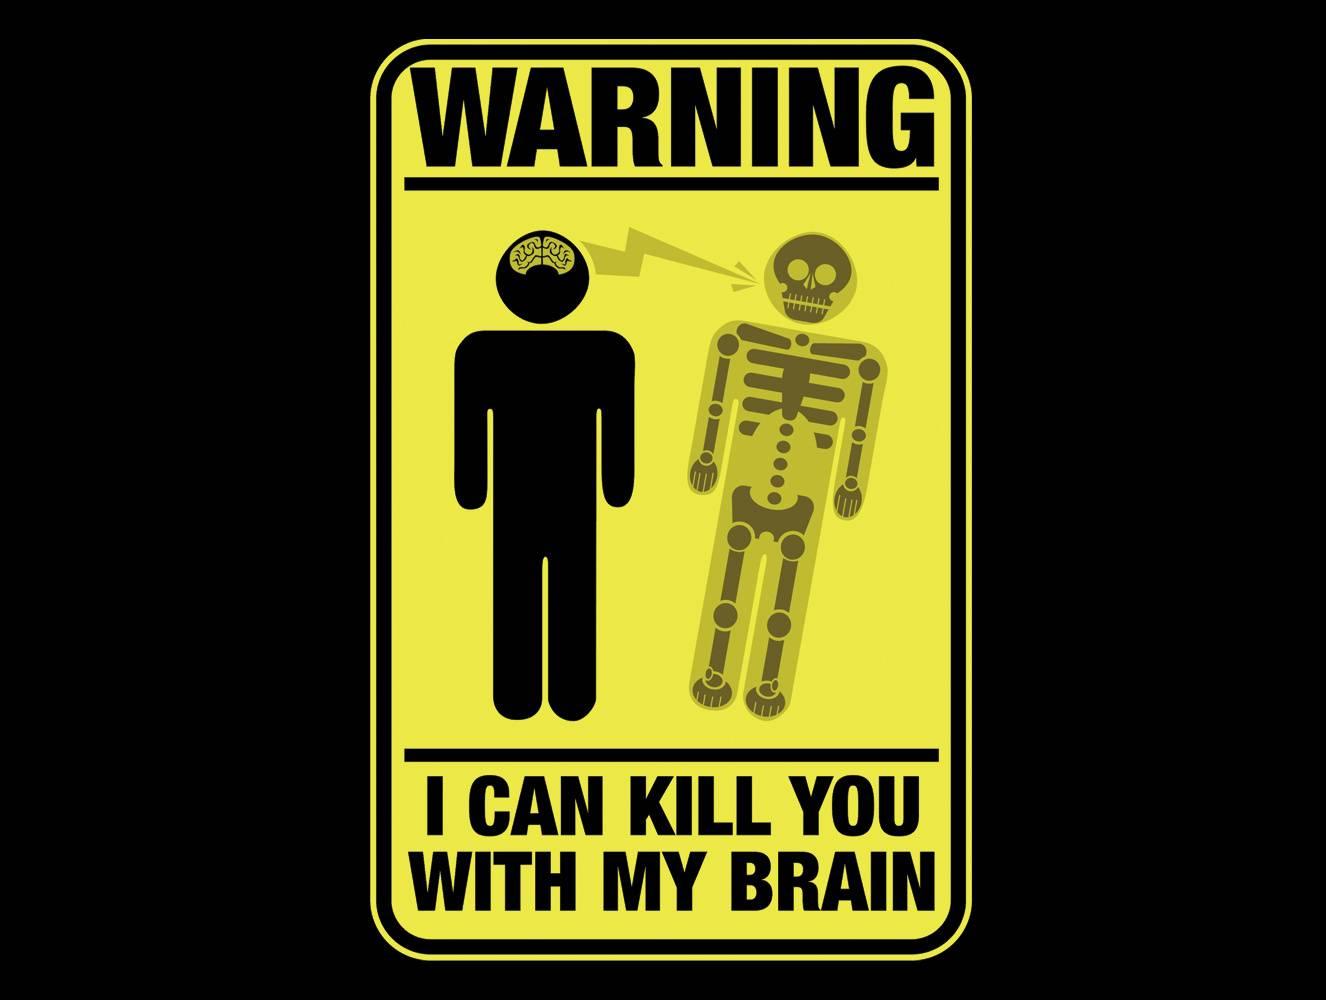 With My Brain